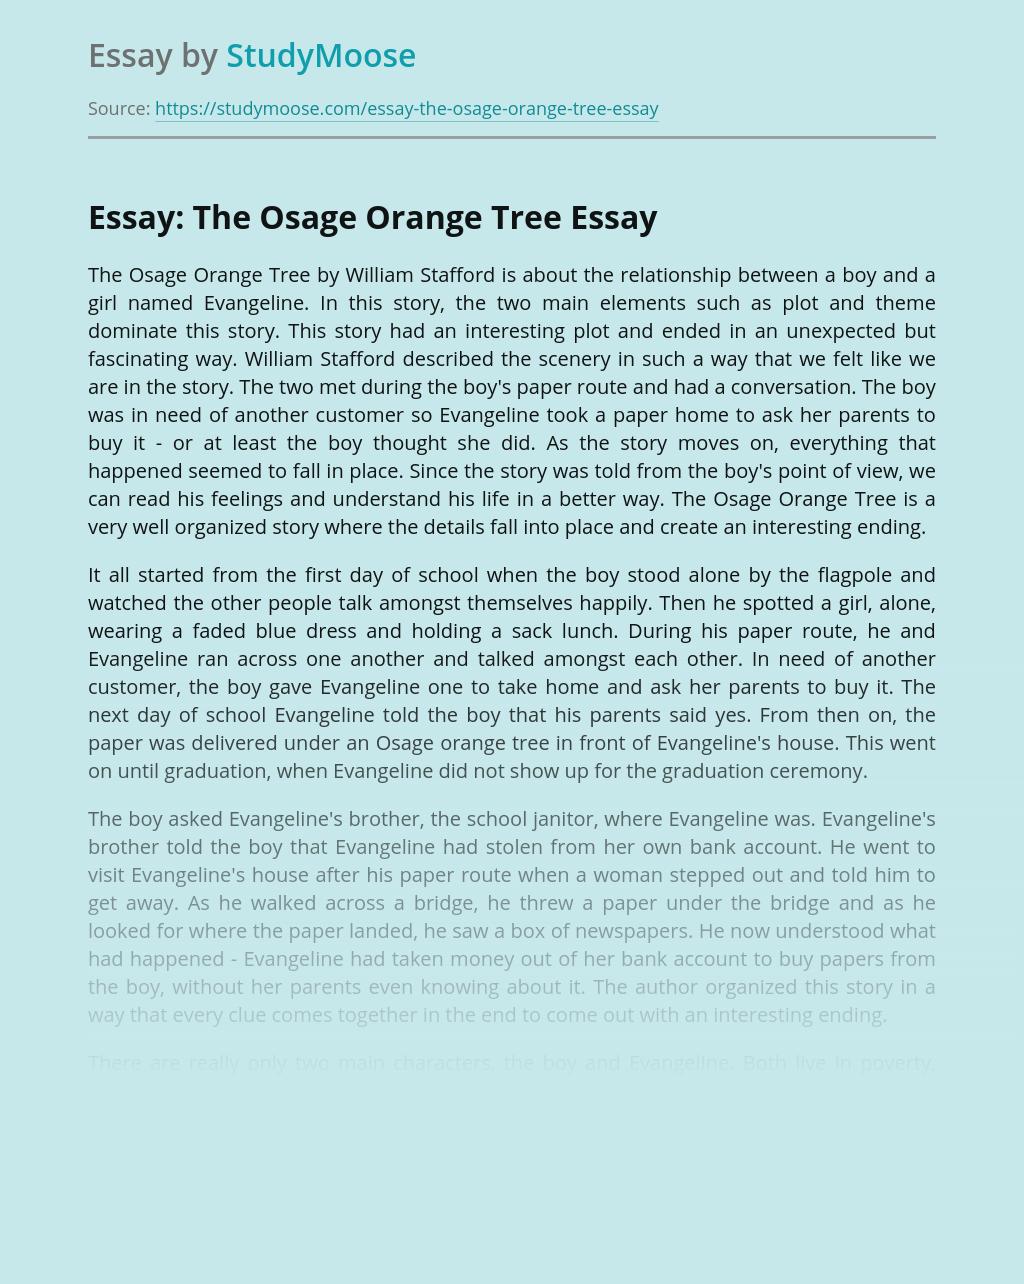 Essay: The Osage Orange Tree